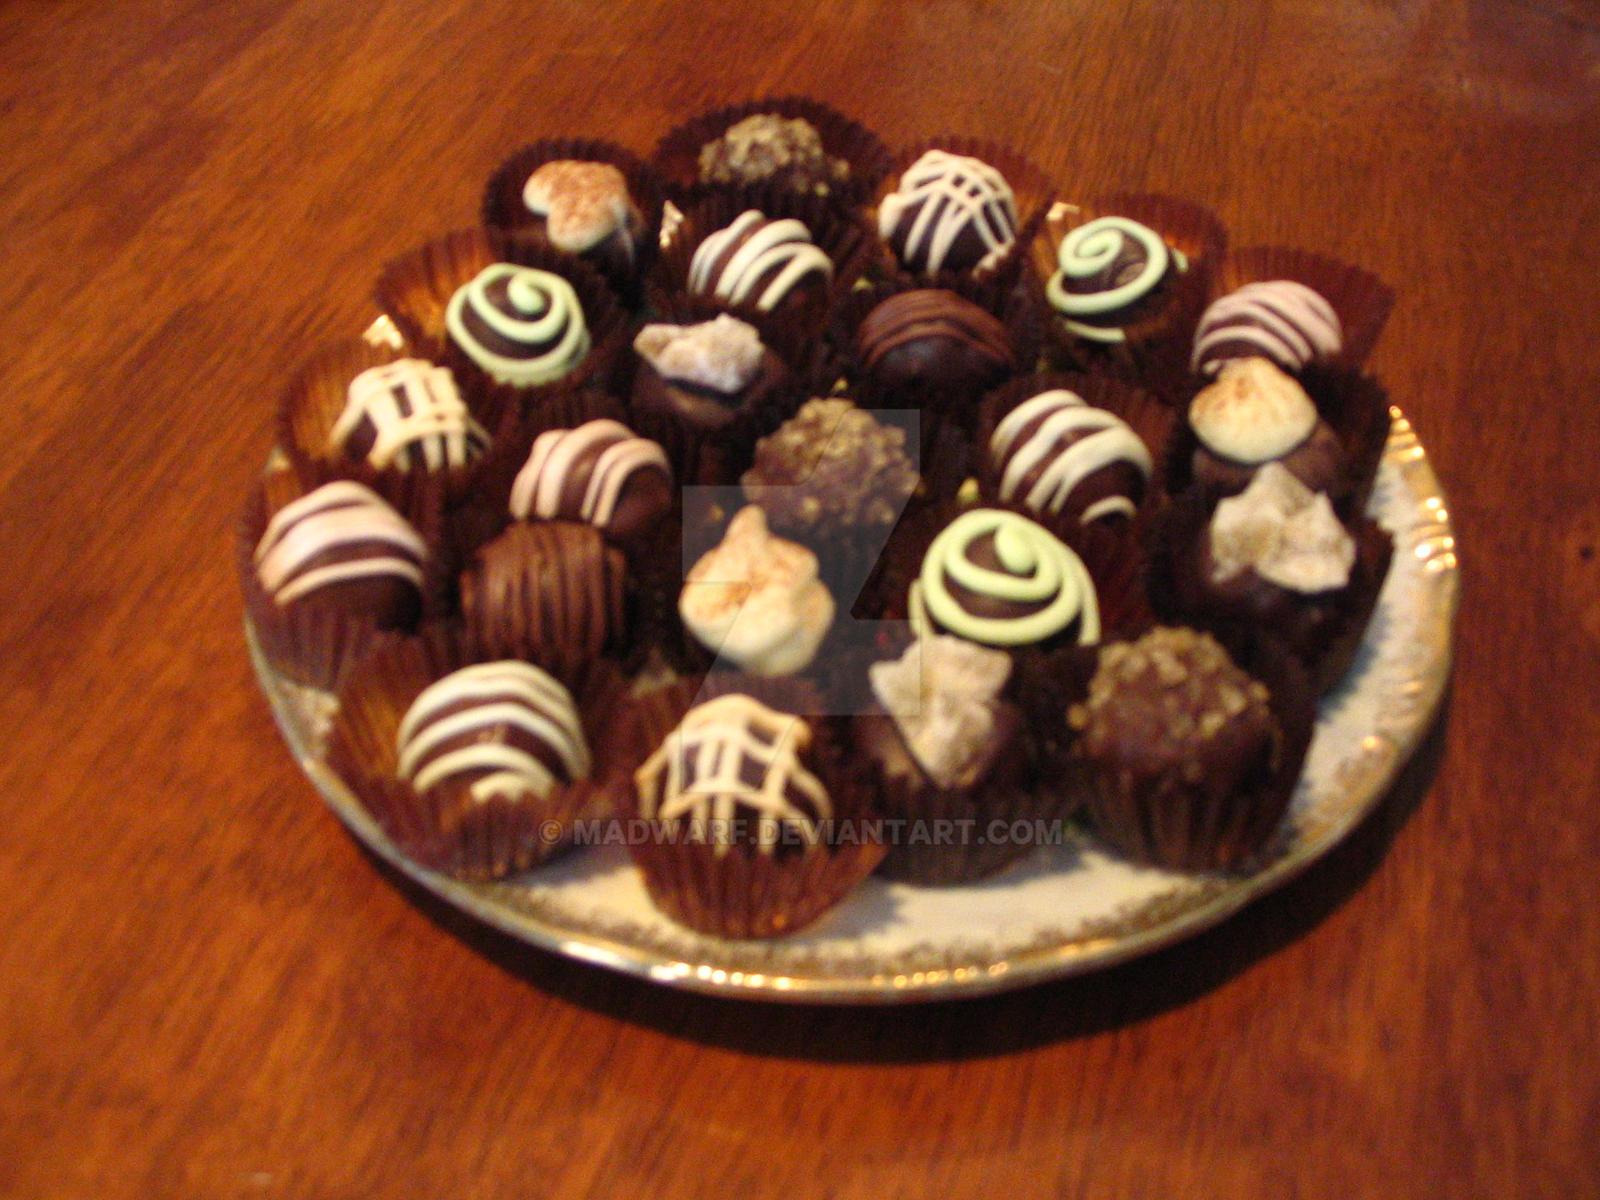 Liquor Chocolates by madwarf on DeviantArt